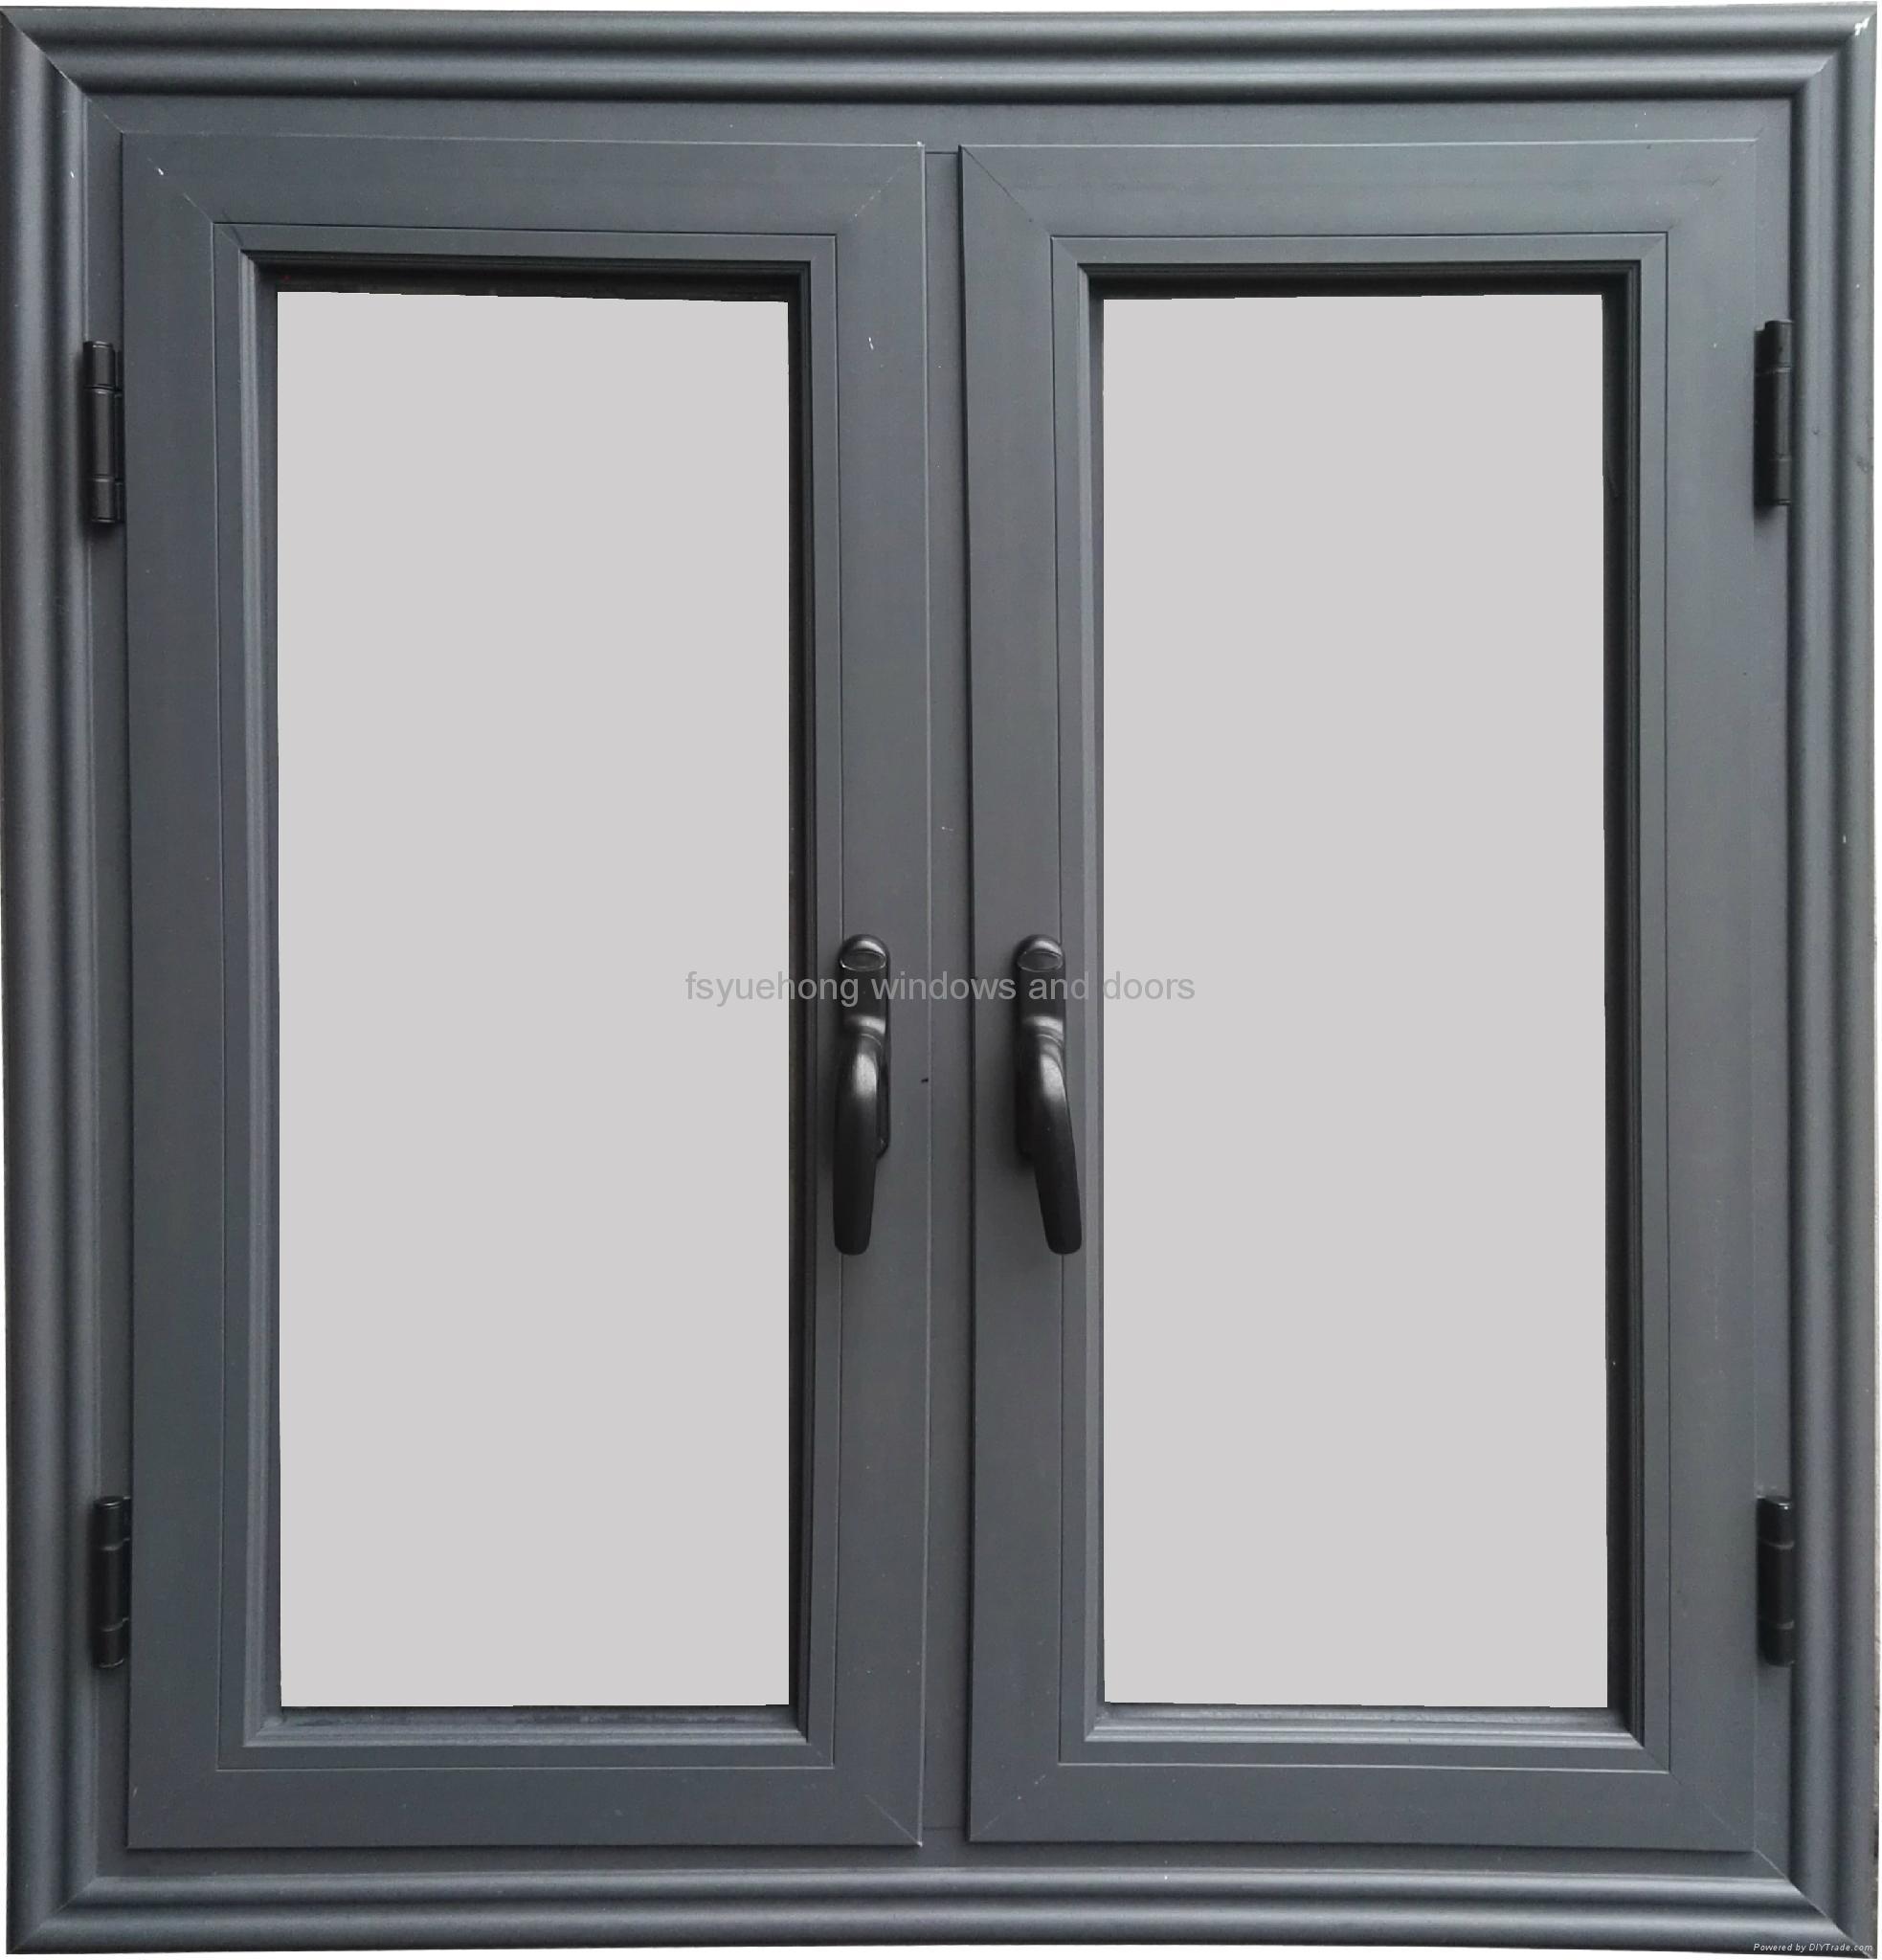 Aluminum Window Companies : Non thermal break aluminum casement window endear